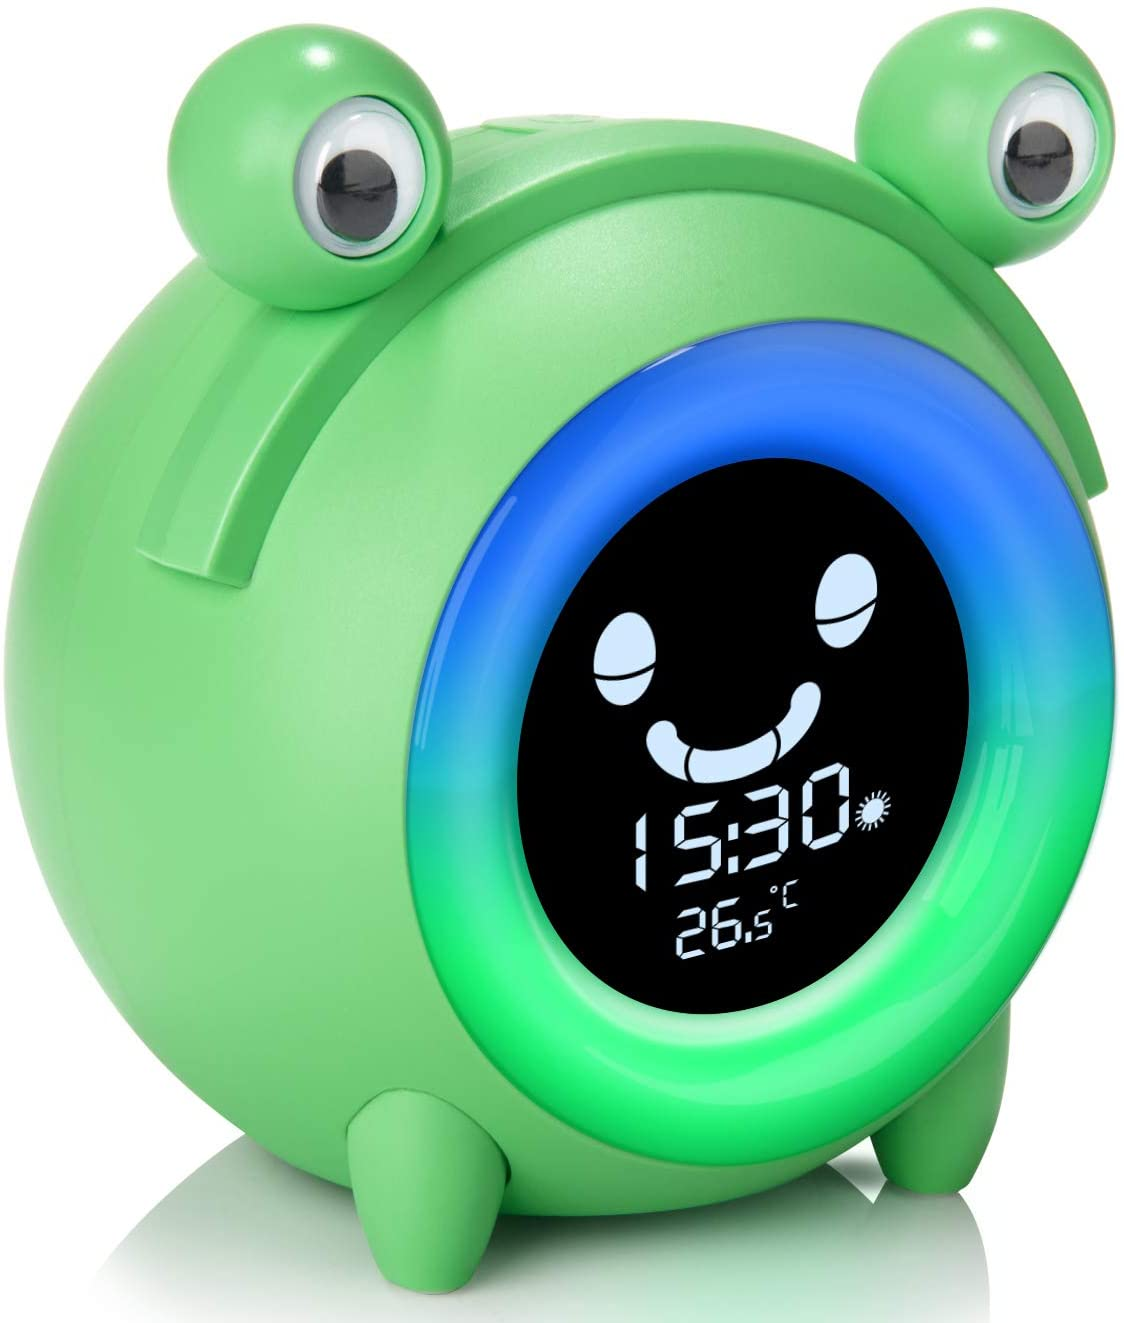 Toddlers Bedtime Regiments Sleep Training Clock